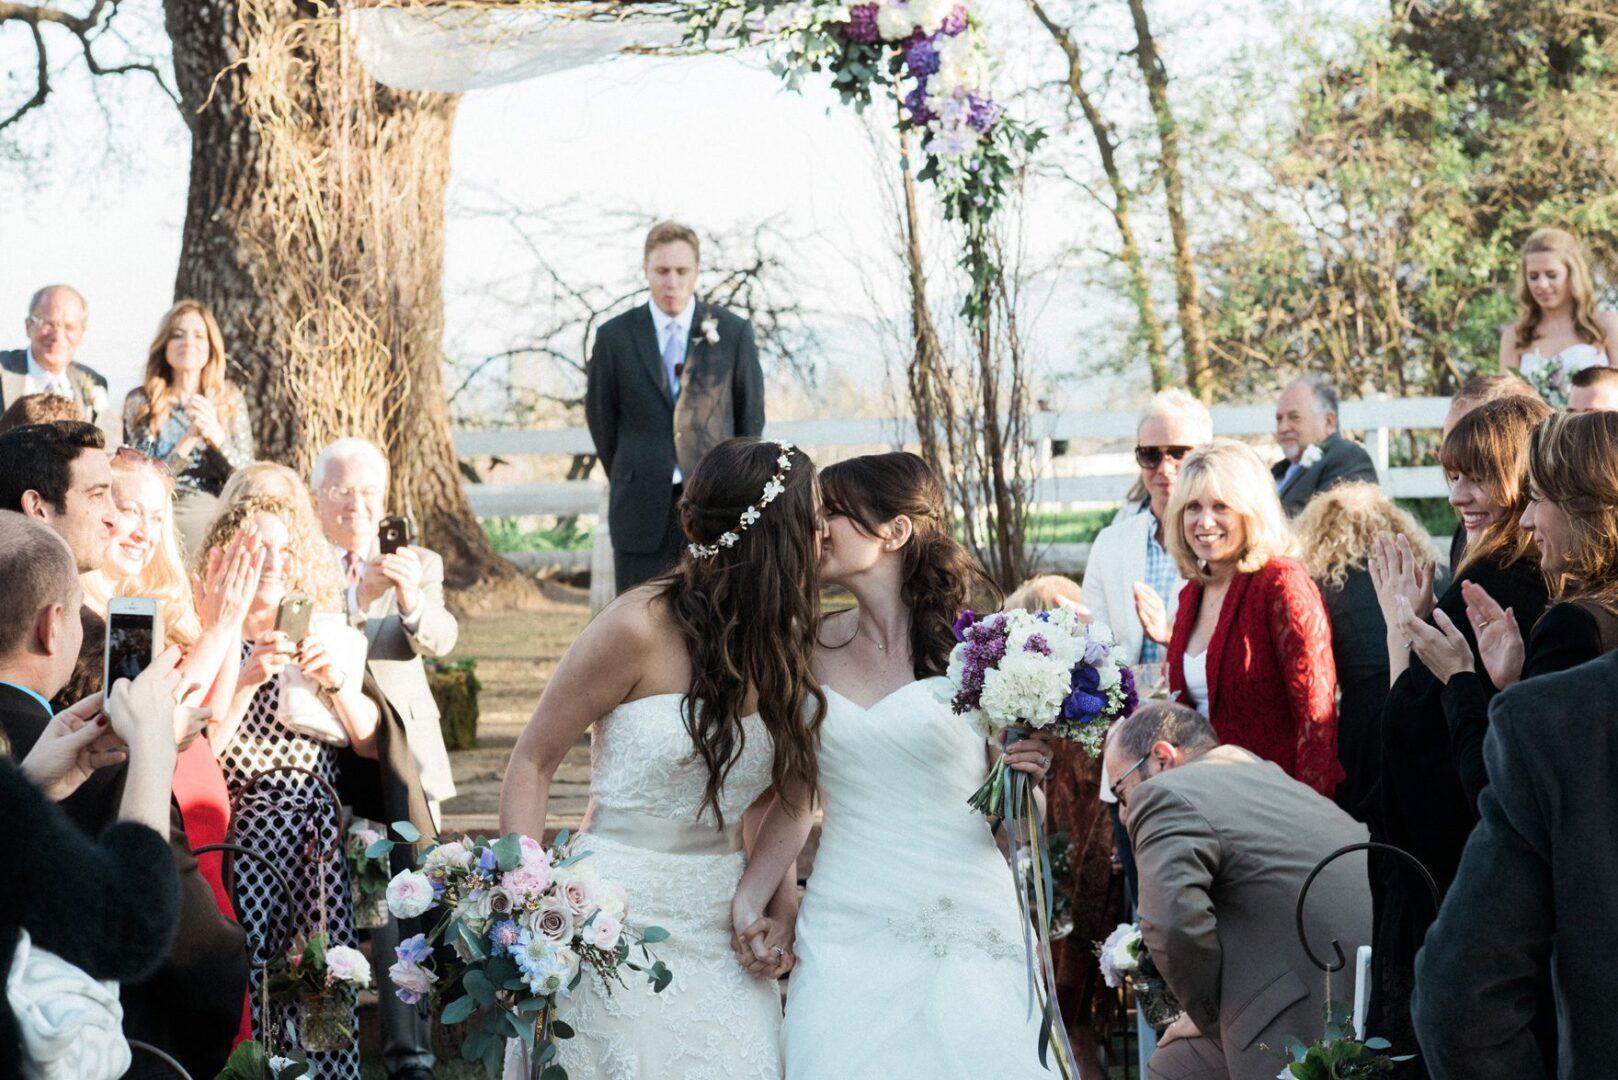 California-Santa-Margarita-Ranch-destination--Saint-Louis-Obispo-wedding-photographer-christina-lilly-photography059